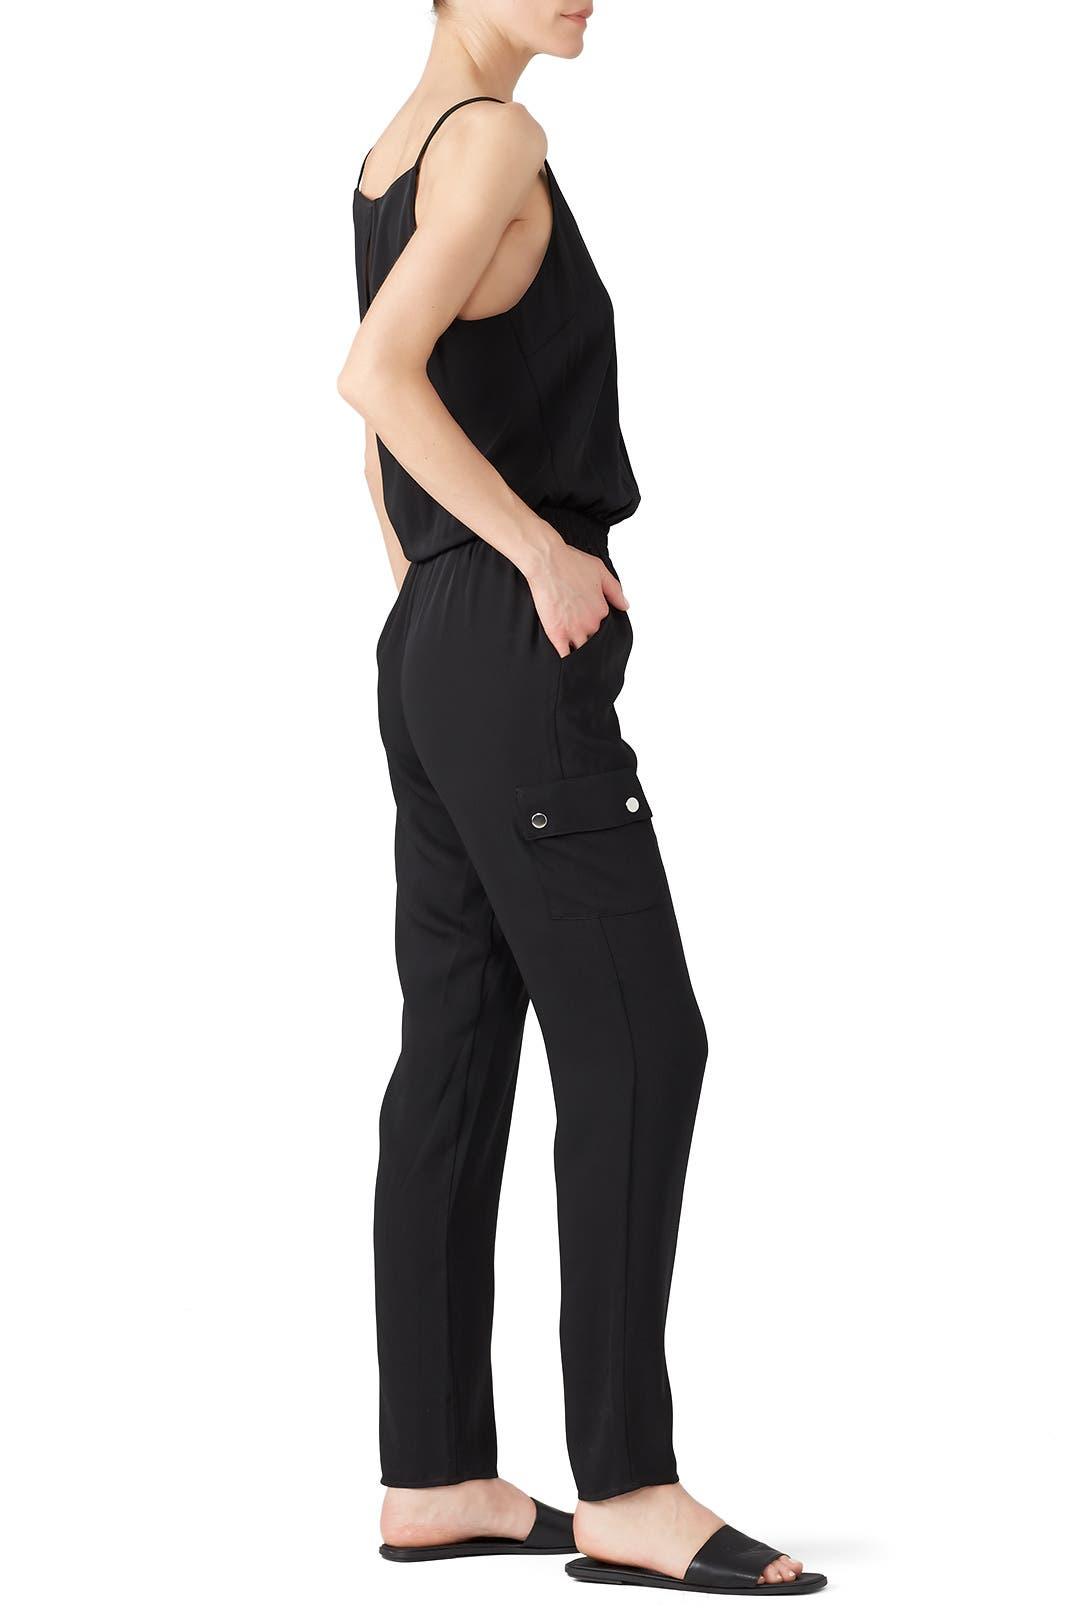 c6522e18a26 Merritt Jumpsuit by Amanda Uprichard for  45